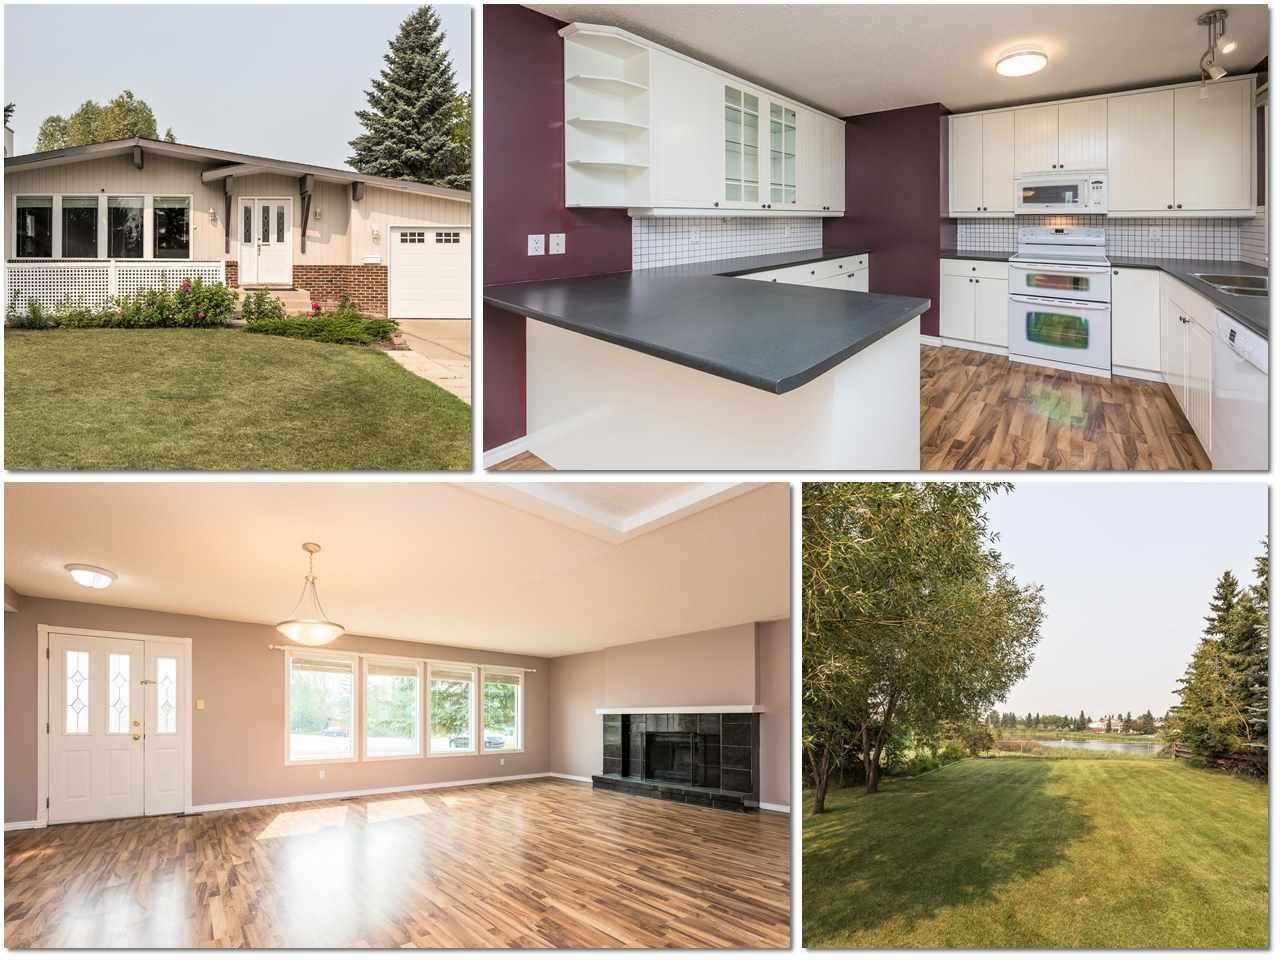 Main Photo: 575 Sunnydale Road: Morinville House for sale : MLS®# E4124885